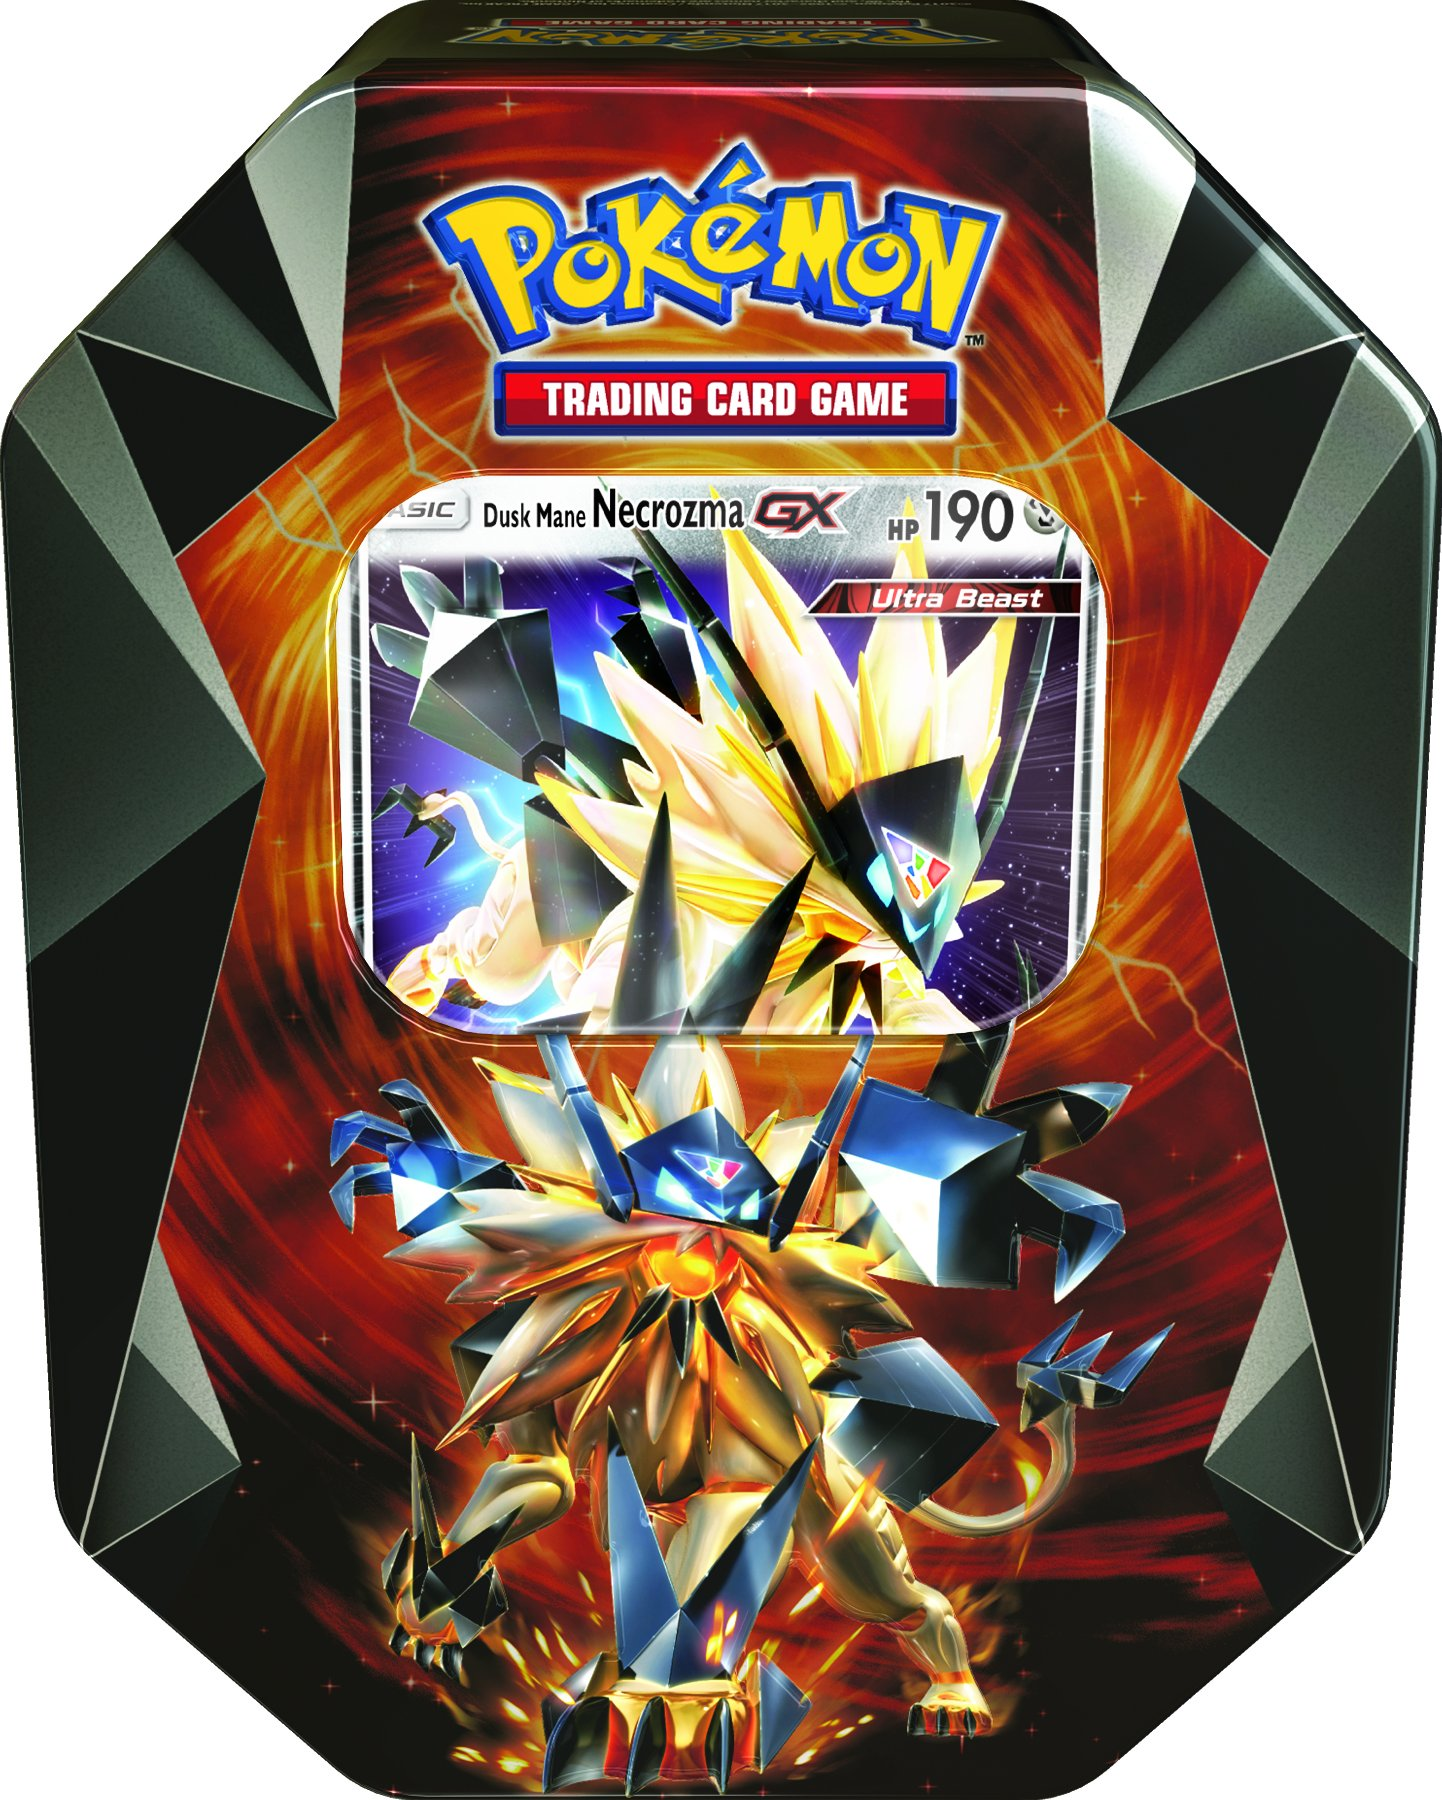 Pokemon Pokémon Tcg: Sun & Moon—Ultra Prism Collectible Cards